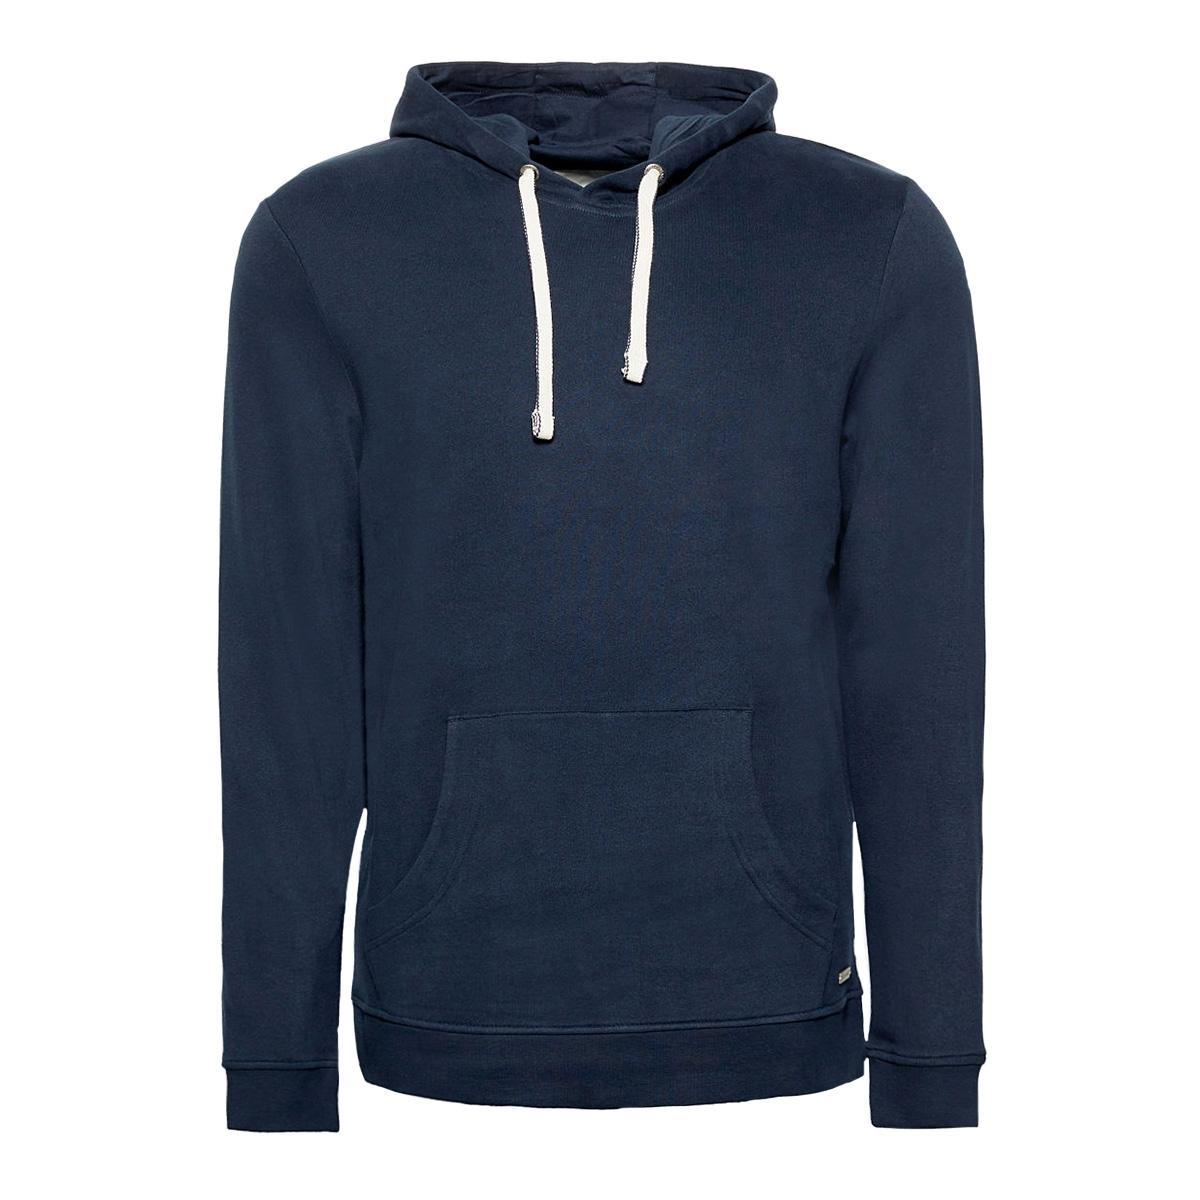 128cc2j008 edc sweater c400